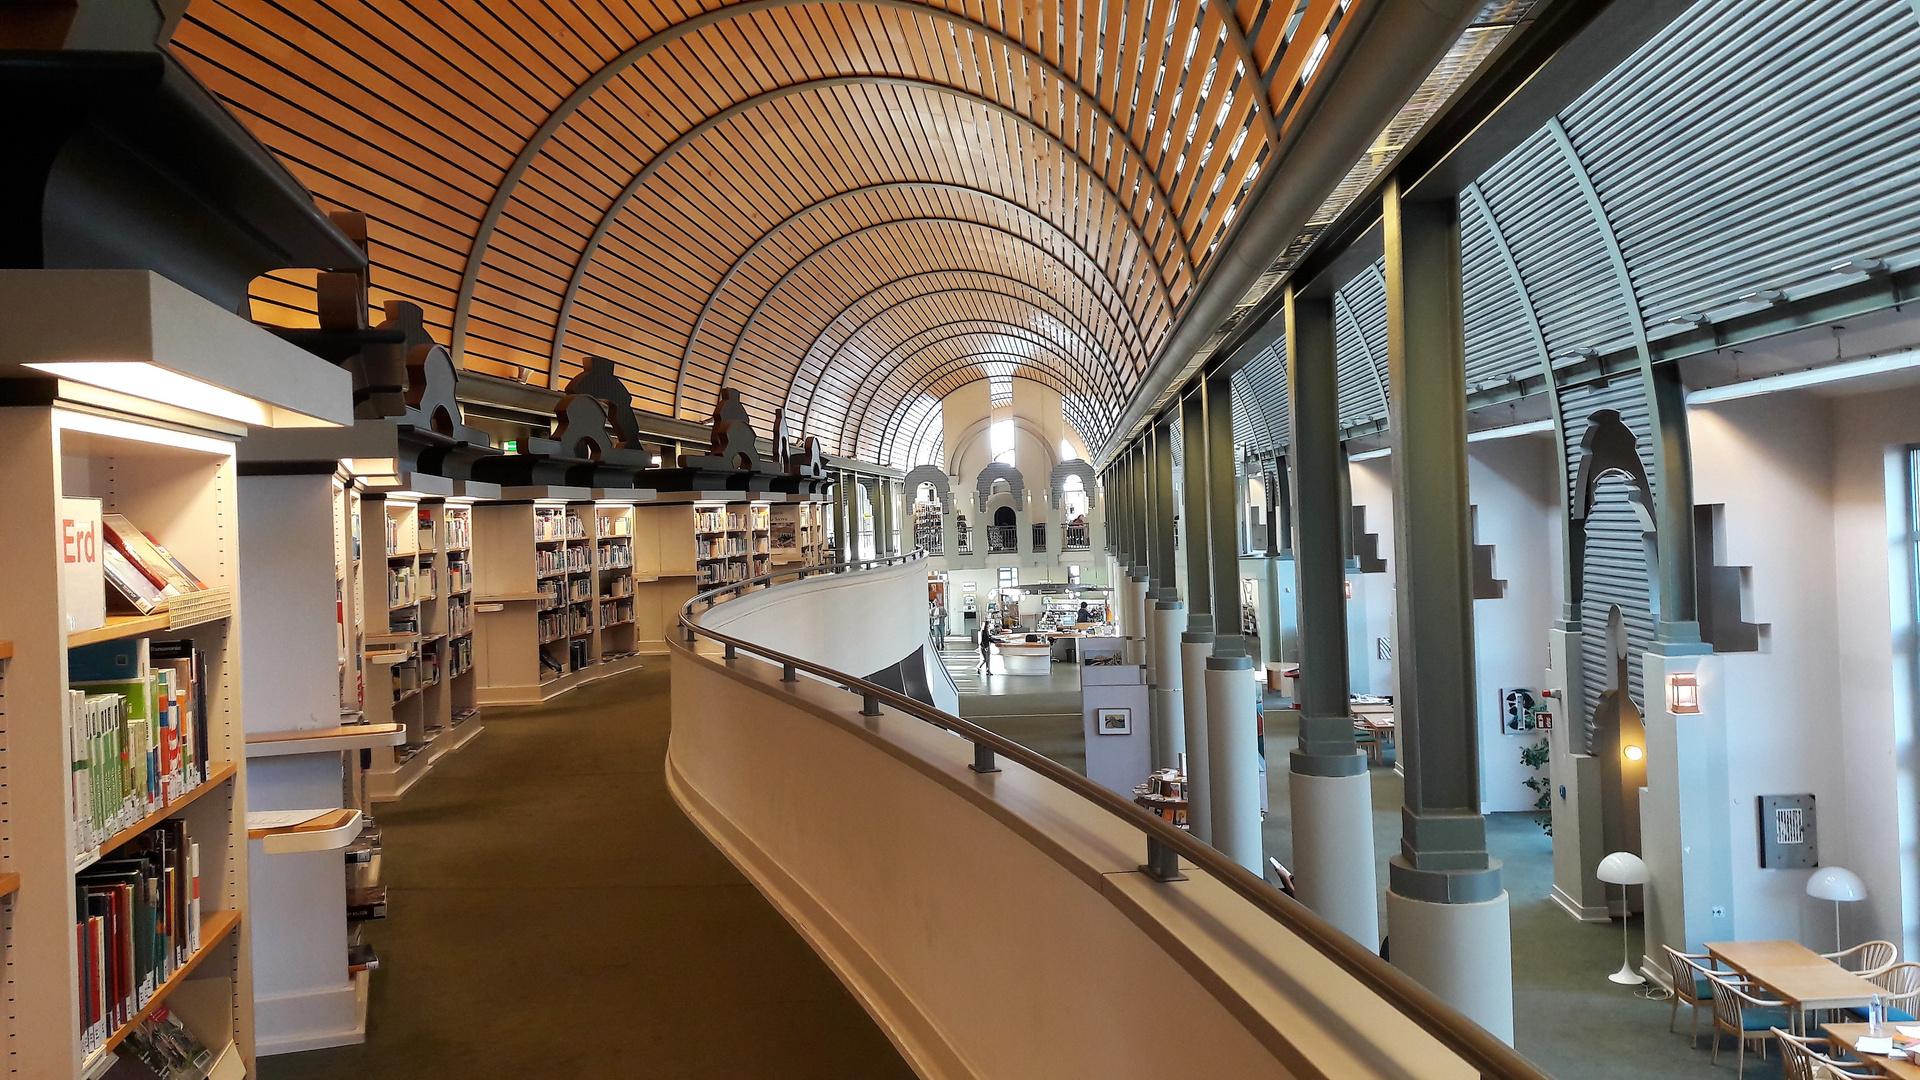 Humboldt -Bibliothek Alt Tegel